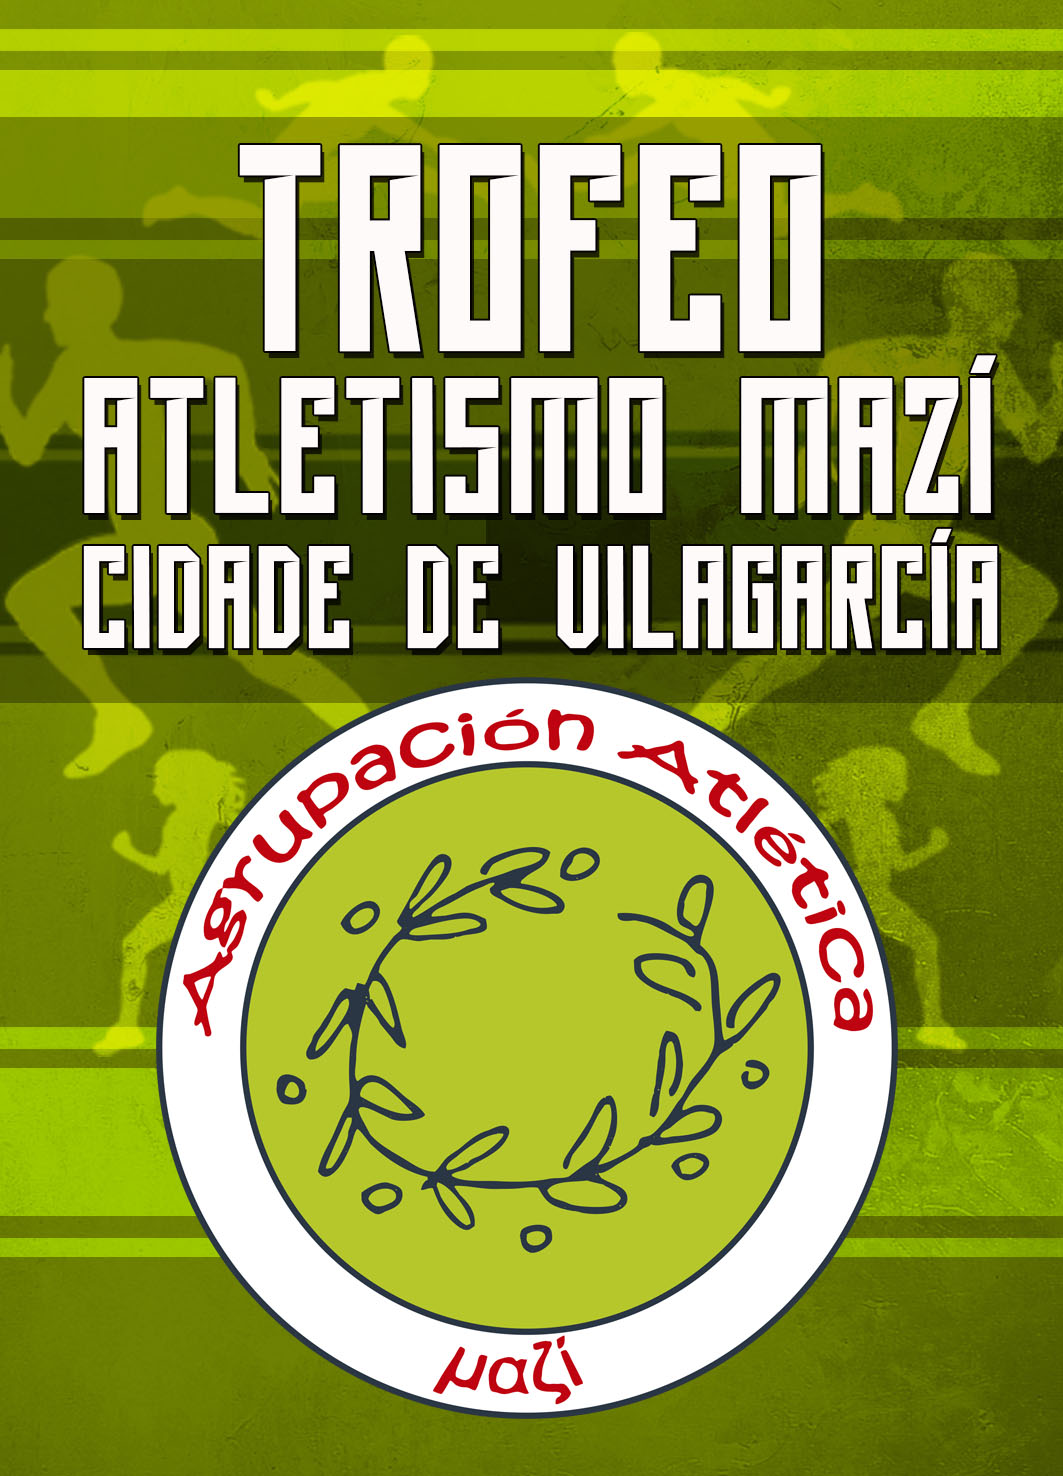 III Trofeo Atletismo Mazí – Cidade de Vilagarcía